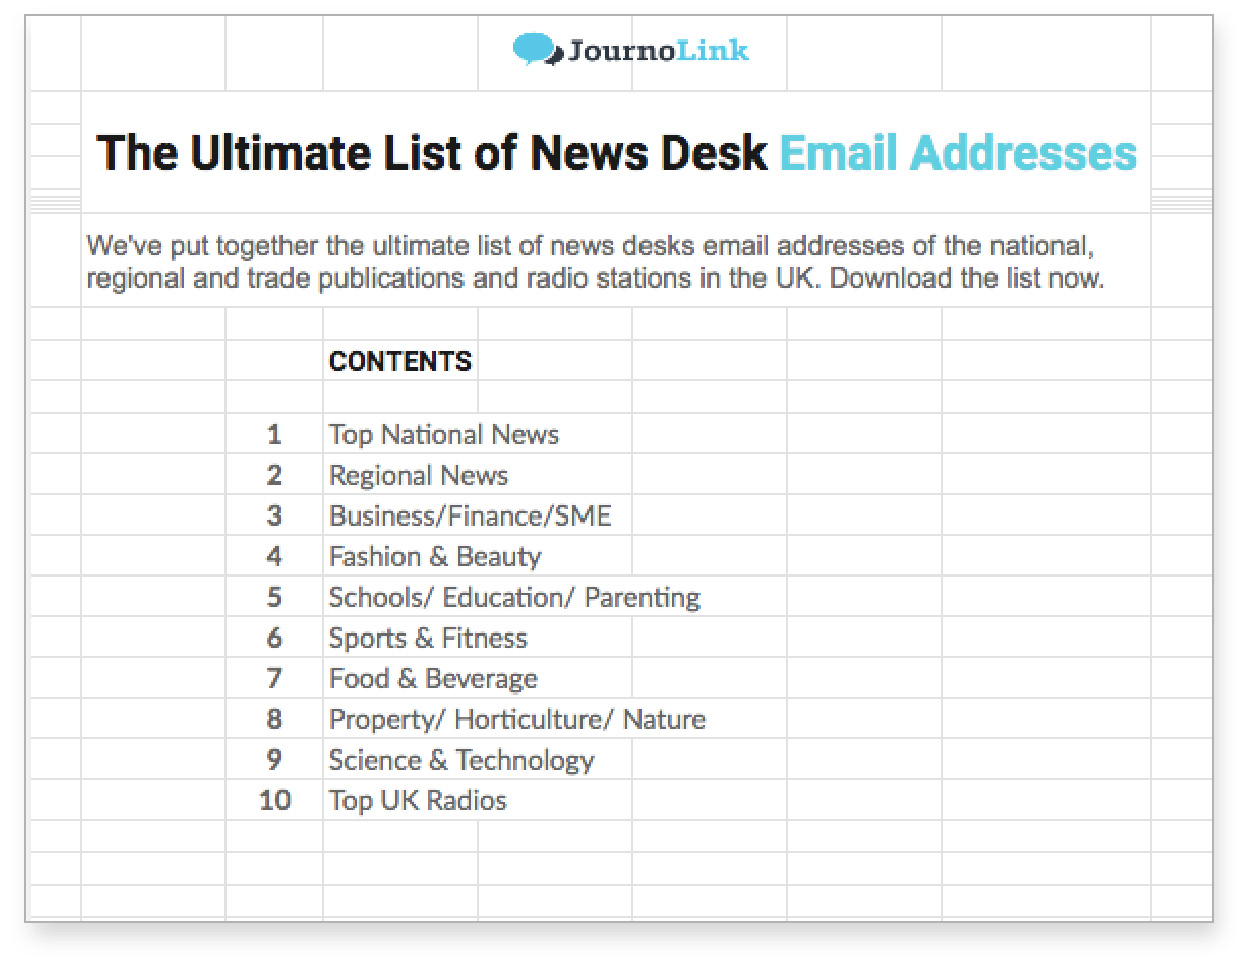 Newsdesk-email-list-publications